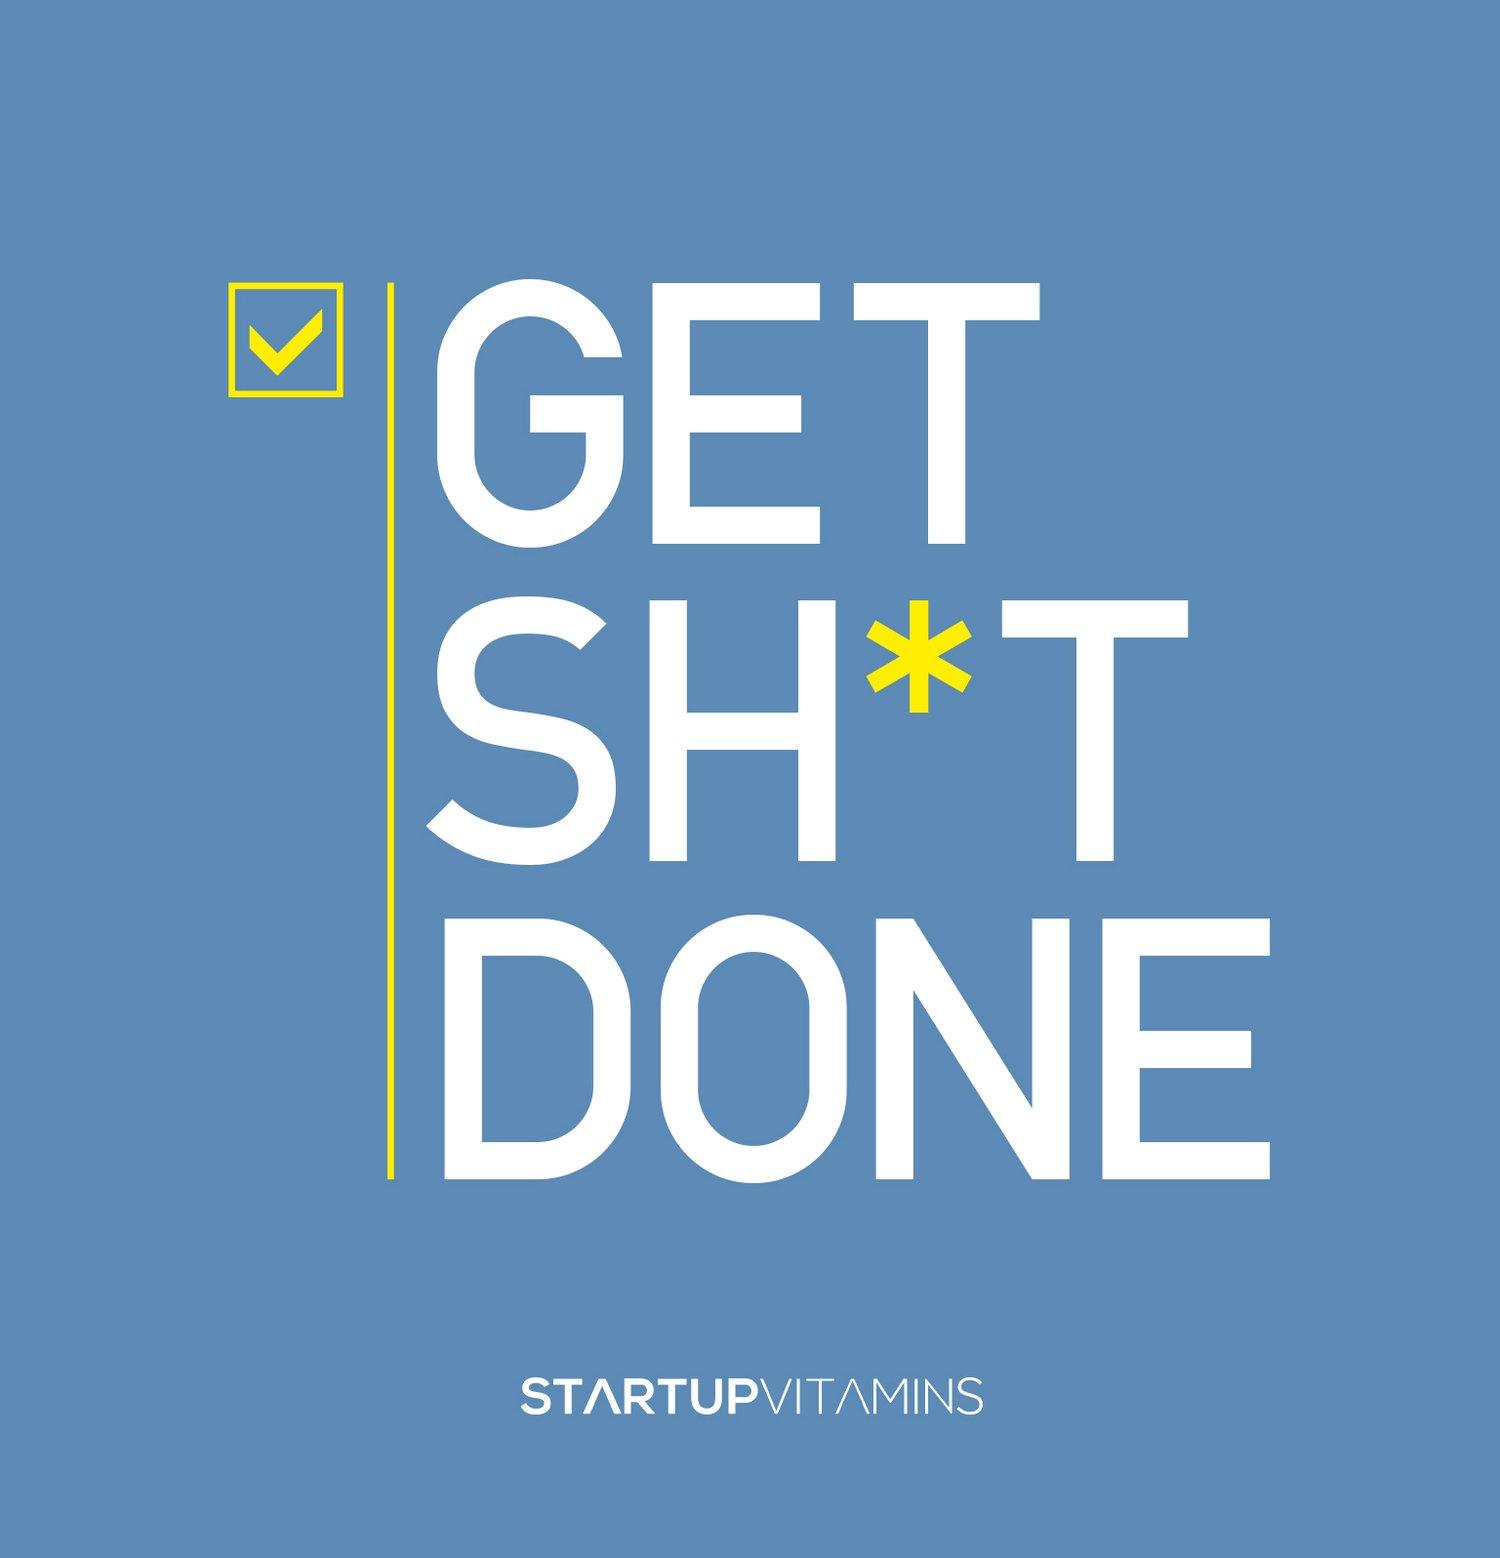 sh t done lauris liberts startup vitamins